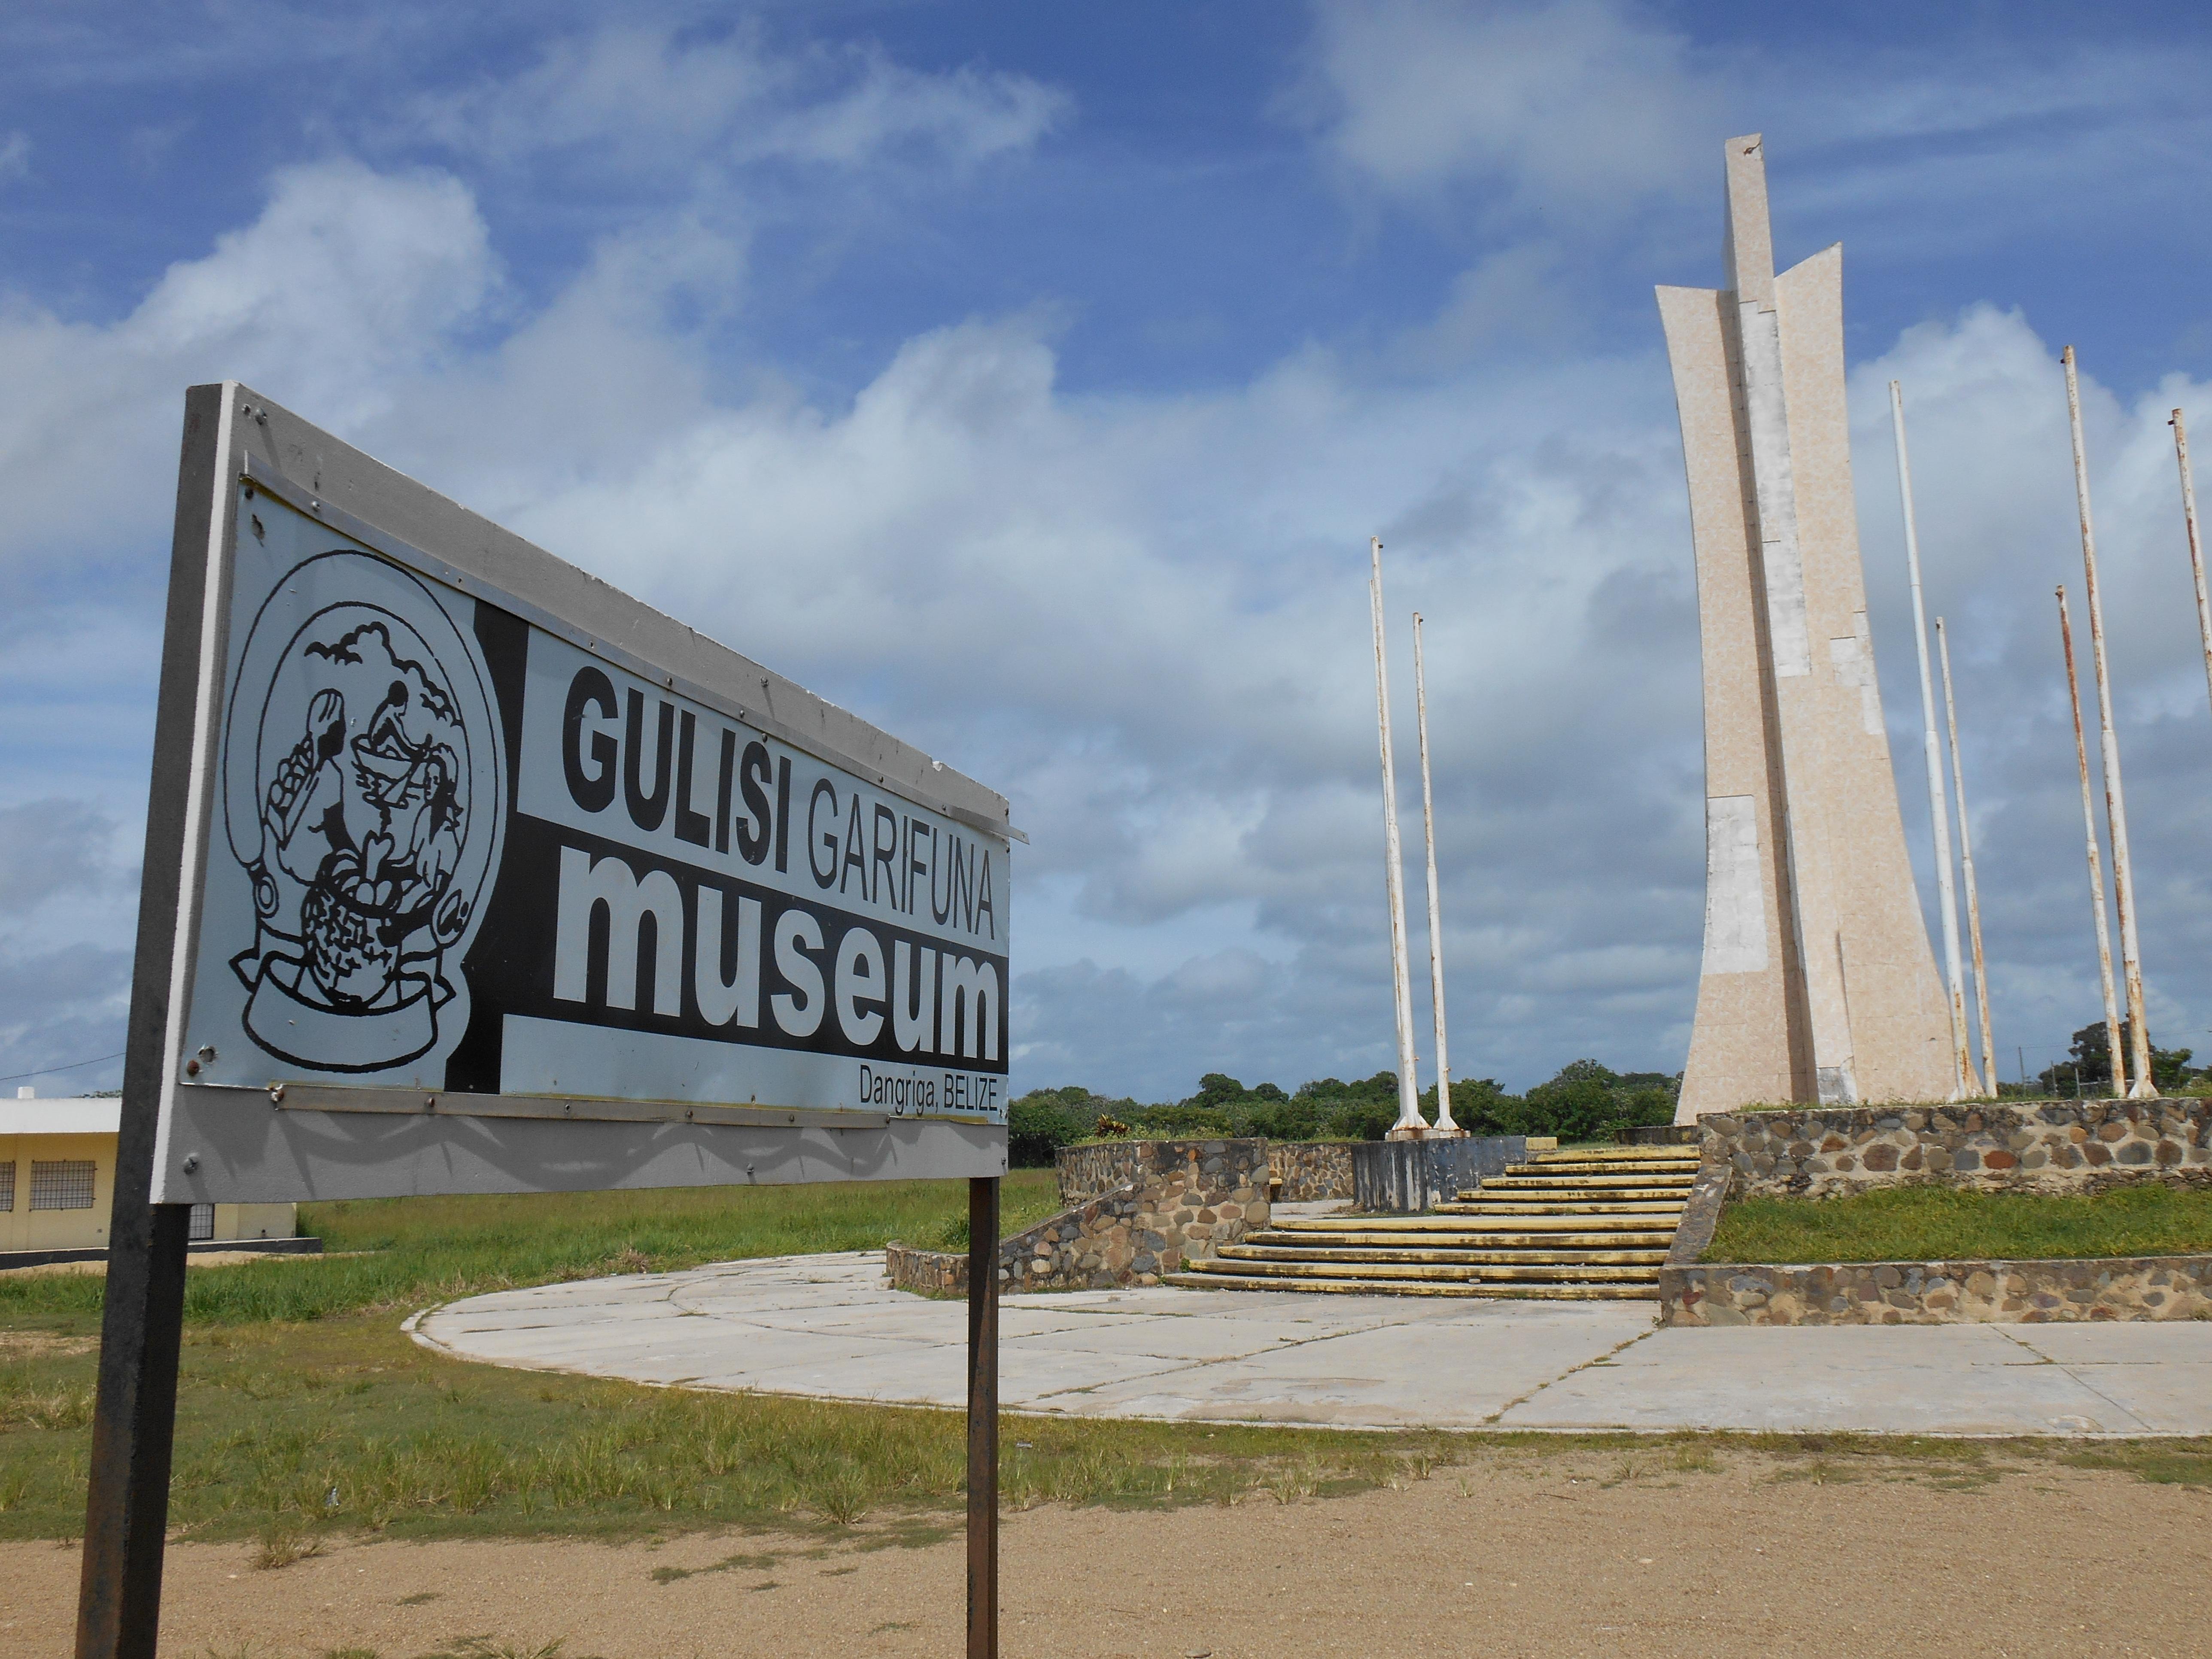 gulisi-garifuna-museum-in-dangriga-belize